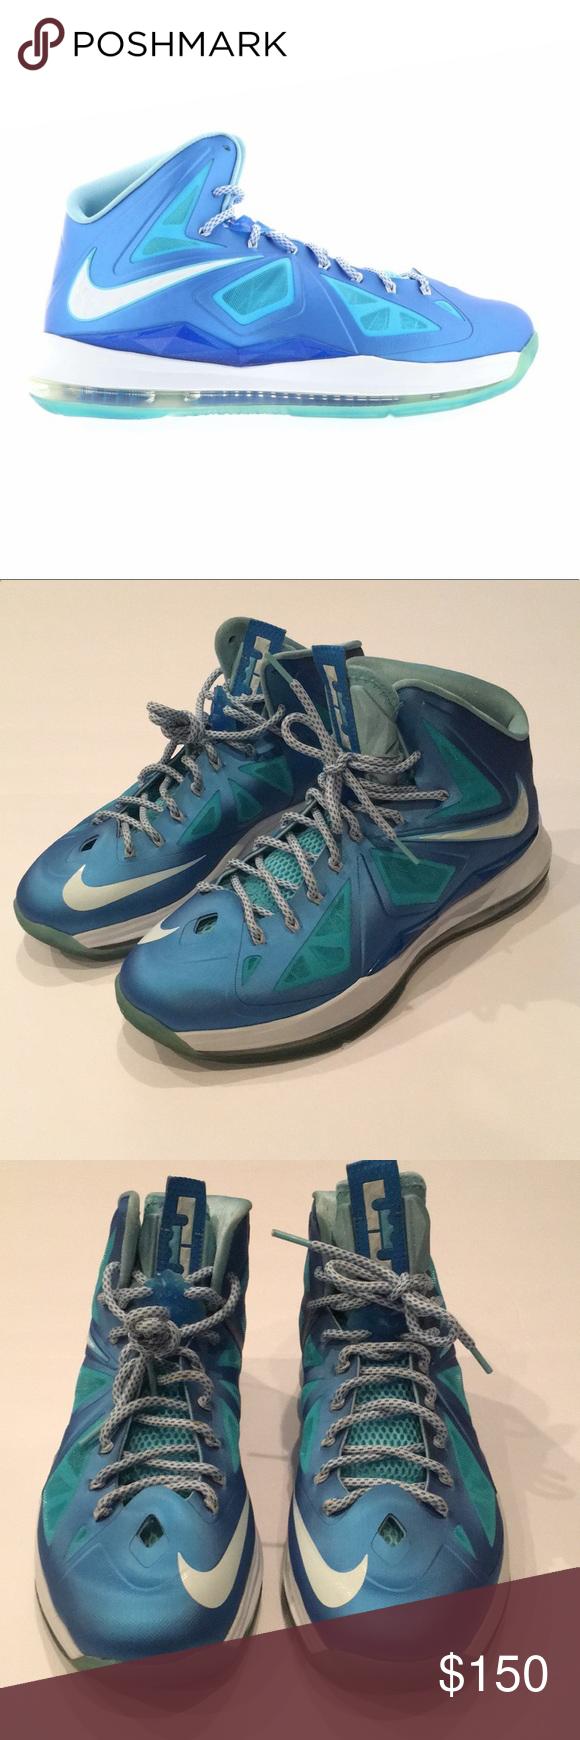 be12a46cd72a Nike Lebron 10+ Blue Diamond AUTHENTIC Great Condition Nike Lebron 10+ Blue  Diamond.